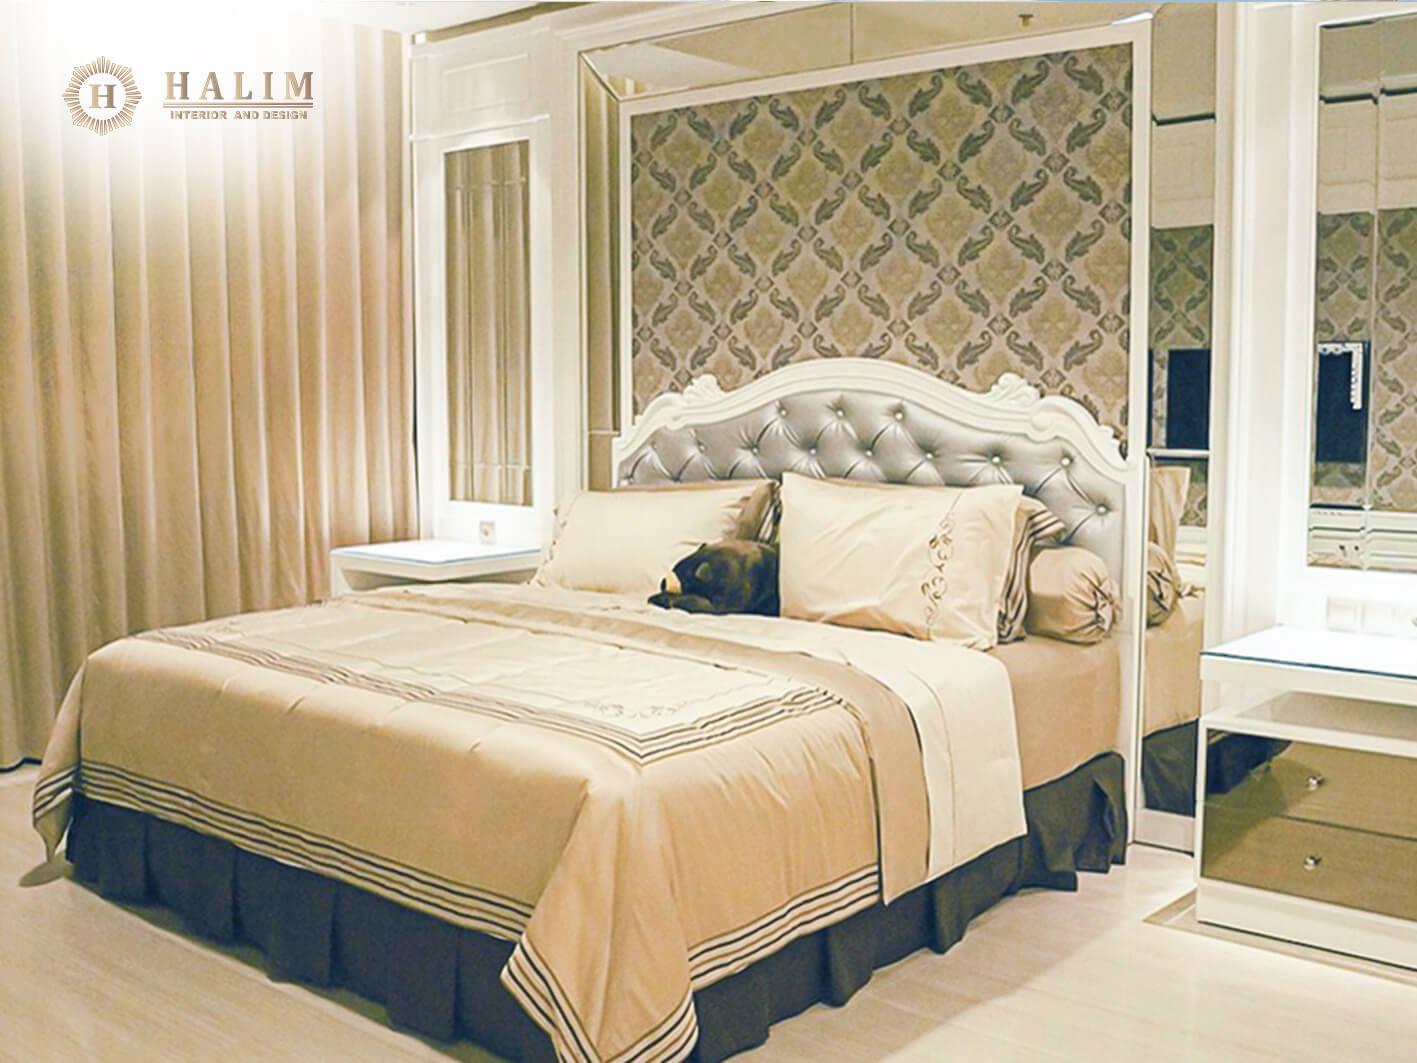 Halim, Interior, modern, furniture, contemporer american style, minimalist, european, classic, surabaya, Lenmarc Adhiwangsa, 4c1a